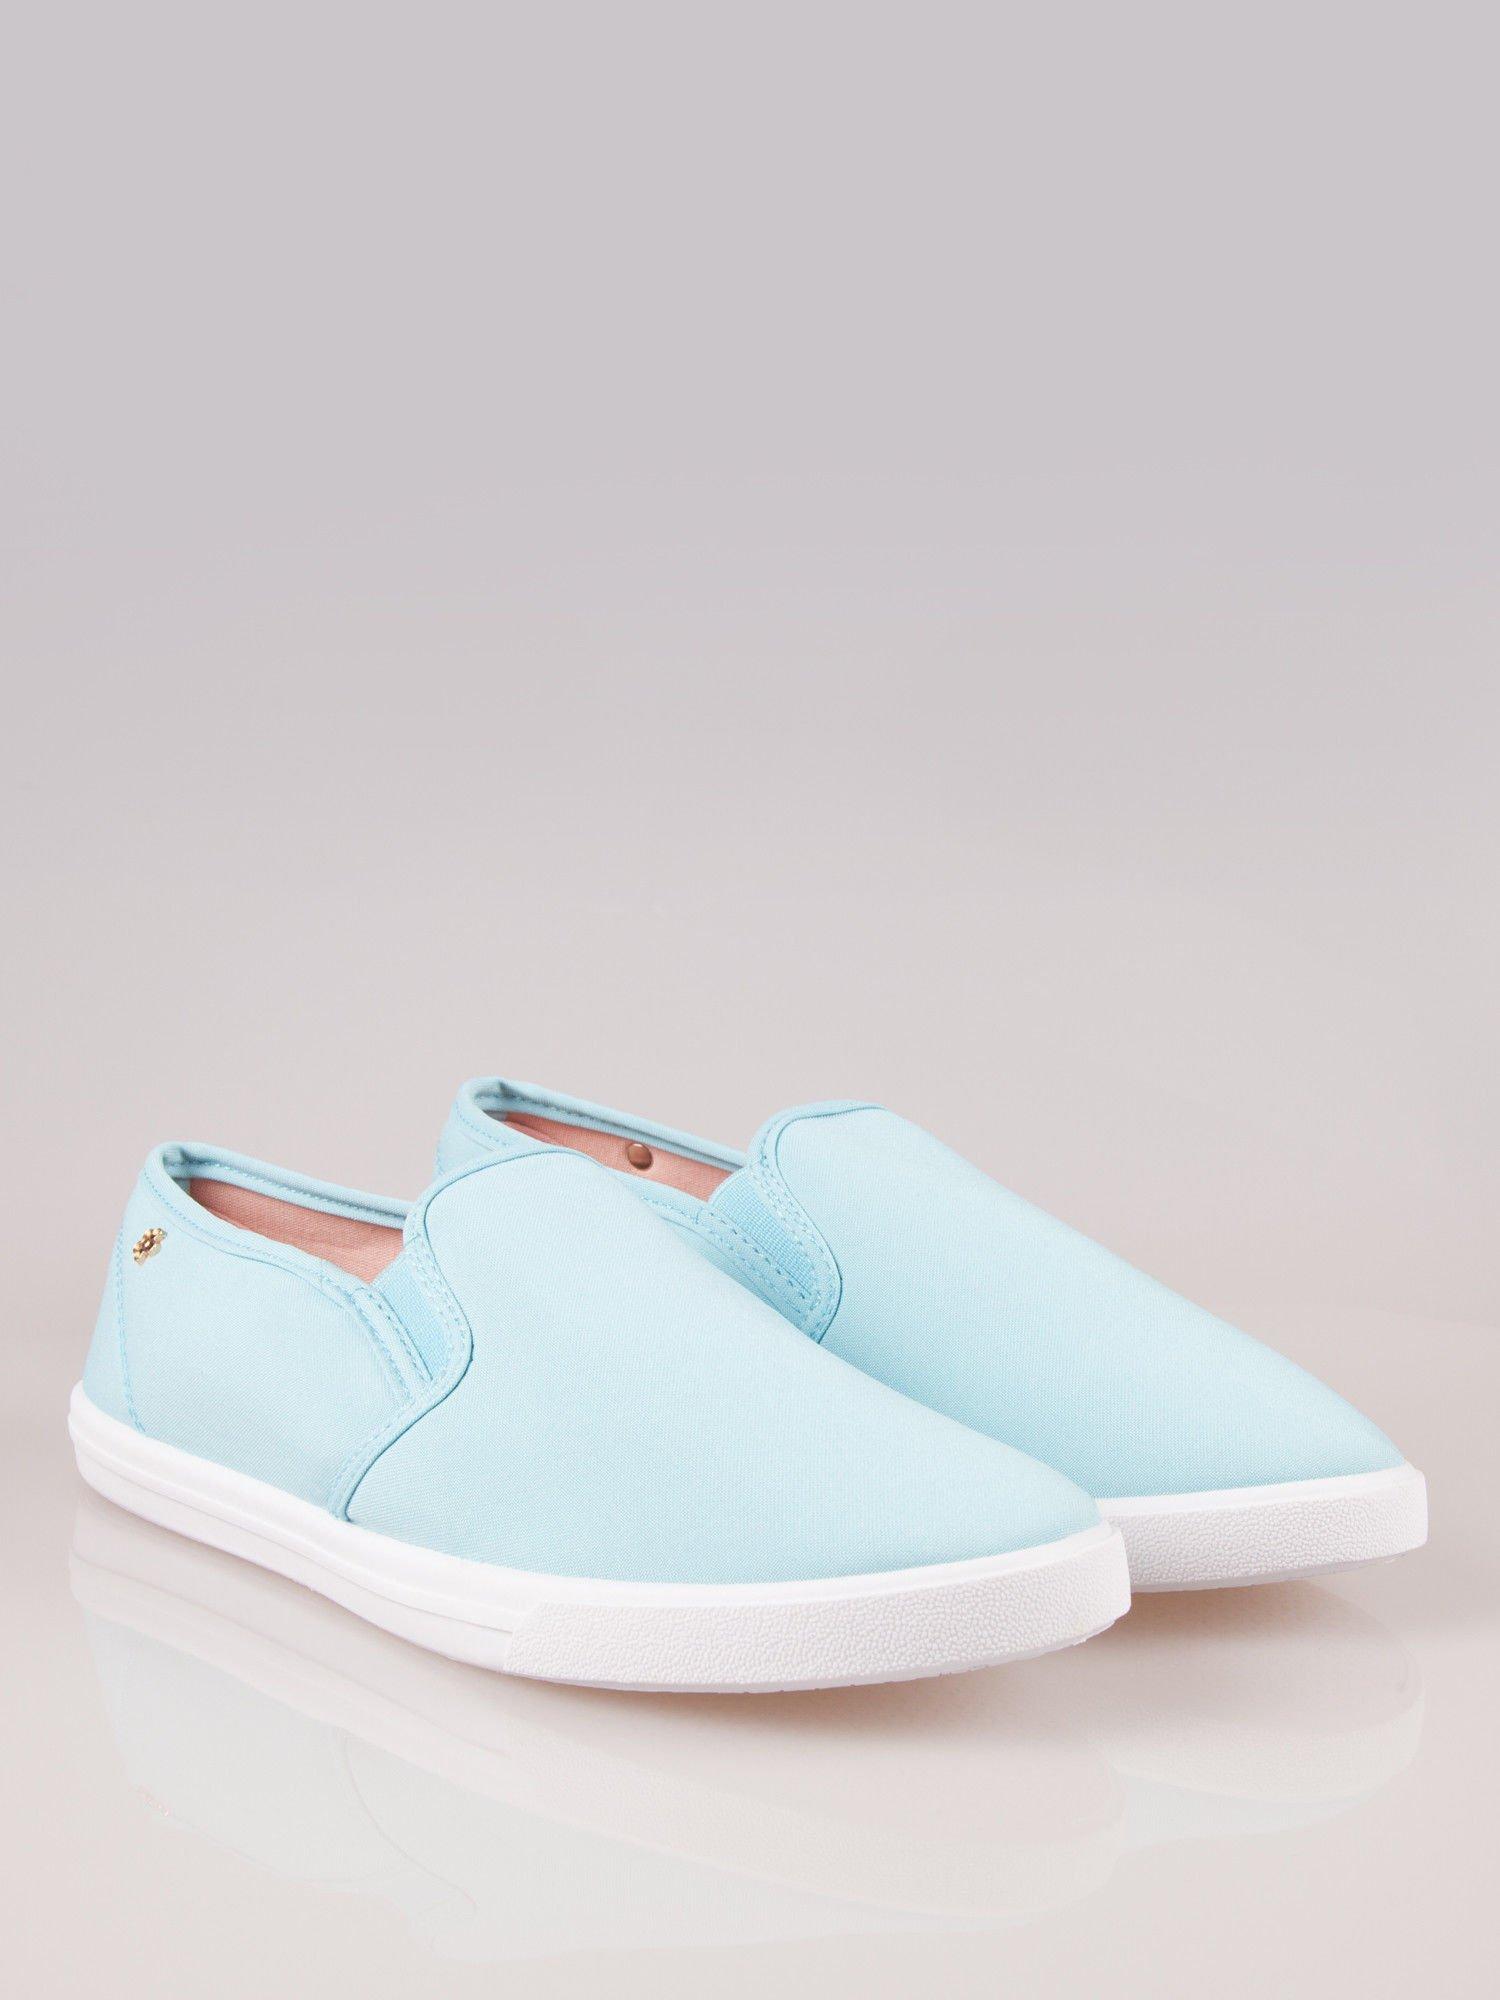 Błękitne buty slip-on                                  zdj.                                  1